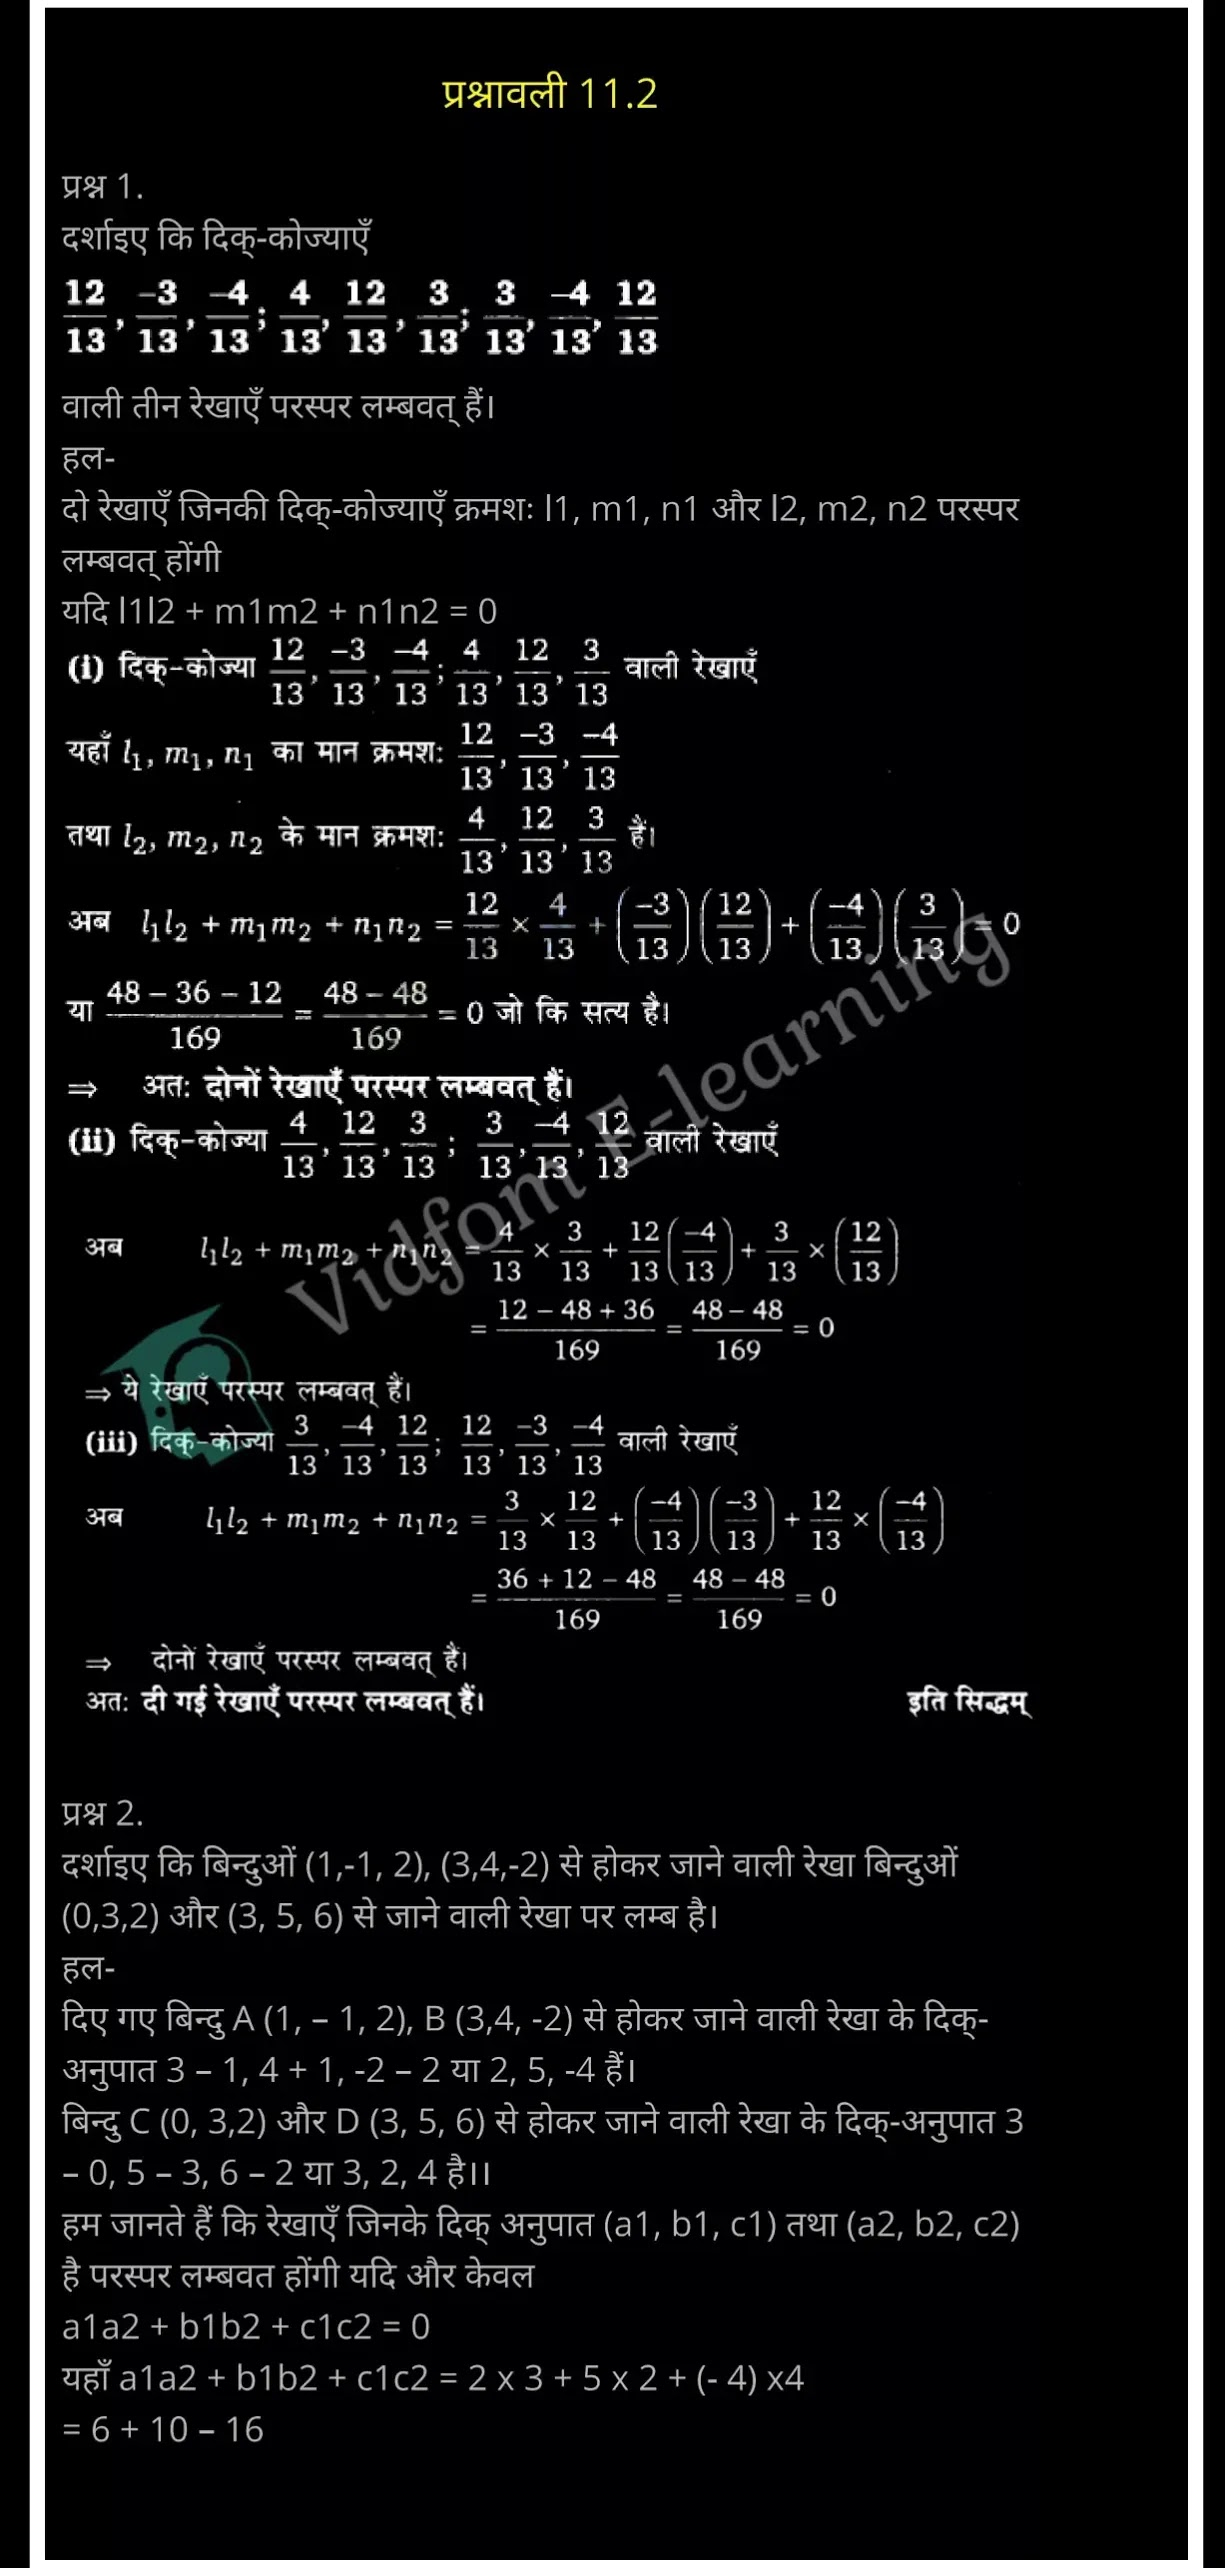 कक्षा 12 गणित  के नोट्स  हिंदी में एनसीईआरटी समाधान,     class 12 Maths Chapter 11,   class 12 Maths Chapter 11 ncert solutions in Hindi,   class 12 Maths Chapter 11 notes in hindi,   class 12 Maths Chapter 11 question answer,   class 12 Maths Chapter 11 notes,   class 12 Maths Chapter 11 class 12 Maths Chapter 11 in  hindi,    class 12 Maths Chapter 11 important questions in  hindi,   class 12 Maths Chapter 11 notes in hindi,    class 12 Maths Chapter 11 test,   class 12 Maths Chapter 11 pdf,   class 12 Maths Chapter 11 notes pdf,   class 12 Maths Chapter 11 exercise solutions,   class 12 Maths Chapter 11 notes study rankers,   class 12 Maths Chapter 11 notes,    class 12 Maths Chapter 11  class 12  notes pdf,   class 12 Maths Chapter 11 class 12  notes  ncert,   class 12 Maths Chapter 11 class 12 pdf,   class 12 Maths Chapter 11  book,   class 12 Maths Chapter 11 quiz class 12  ,    11  th class 12 Maths Chapter 11  book up board,   up board 11  th class 12 Maths Chapter 11 notes,  class 12 Maths,   class 12 Maths ncert solutions in Hindi,   class 12 Maths notes in hindi,   class 12 Maths question answer,   class 12 Maths notes,  class 12 Maths class 12 Maths Chapter 11 in  hindi,    class 12 Maths important questions in  hindi,   class 12 Maths notes in hindi,    class 12 Maths test,  class 12 Maths class 12 Maths Chapter 11 pdf,   class 12 Maths notes pdf,   class 12 Maths exercise solutions,   class 12 Maths,  class 12 Maths notes study rankers,   class 12 Maths notes,  class 12 Maths notes,   class 12 Maths  class 12  notes pdf,   class 12 Maths class 12  notes  ncert,   class 12 Maths class 12 pdf,   class 12 Maths  book,  class 12 Maths quiz class 12  ,  11  th class 12 Maths    book up board,    up board 11  th class 12 Maths notes,      कक्षा 12 गणित अध्याय 11 ,  कक्षा 12 गणित, कक्षा 12 गणित अध्याय 11  के नोट्स हिंदी में,  कक्षा 12 का हिंदी अध्याय 11 का प्रश्न उत्तर,  कक्षा 12 गणित अध्याय 11 के नोट्स,  11 कक्षा गणित  हिंदी में, कक्षा 12 गणित अध्याय 11  हिं